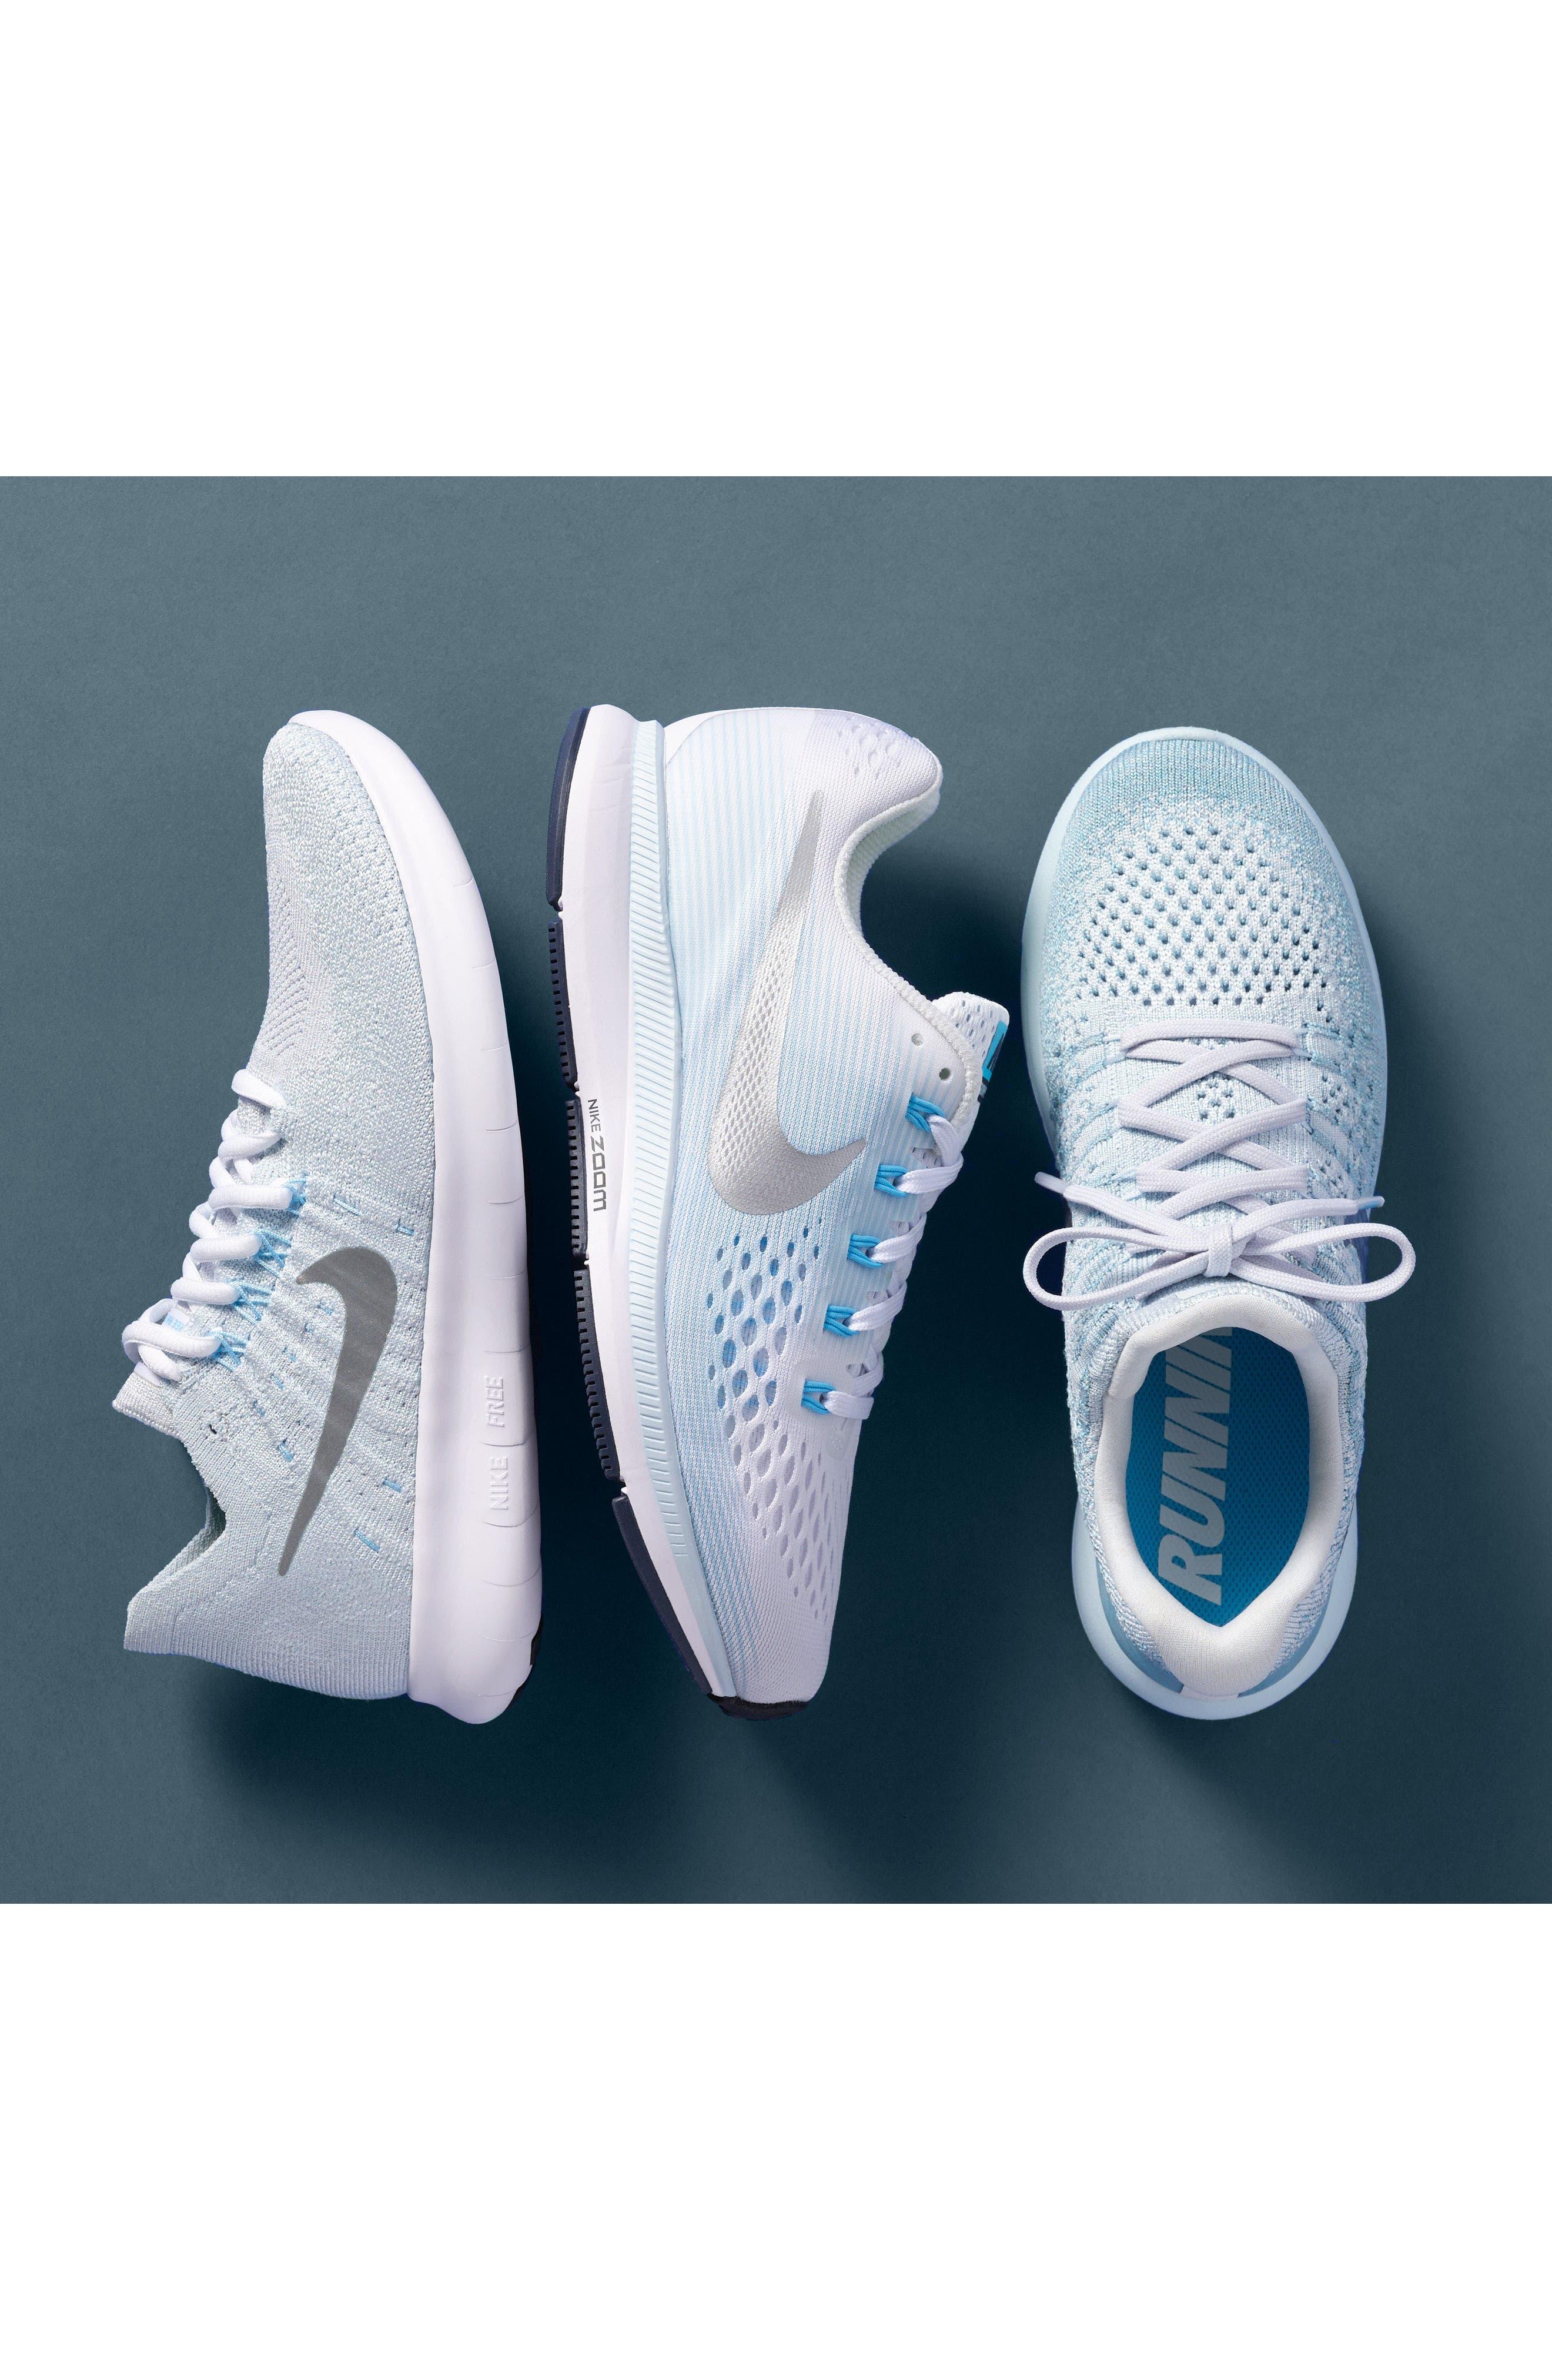 Free Run Flyknit 2 Running Shoe,                         Main,                         color, 027